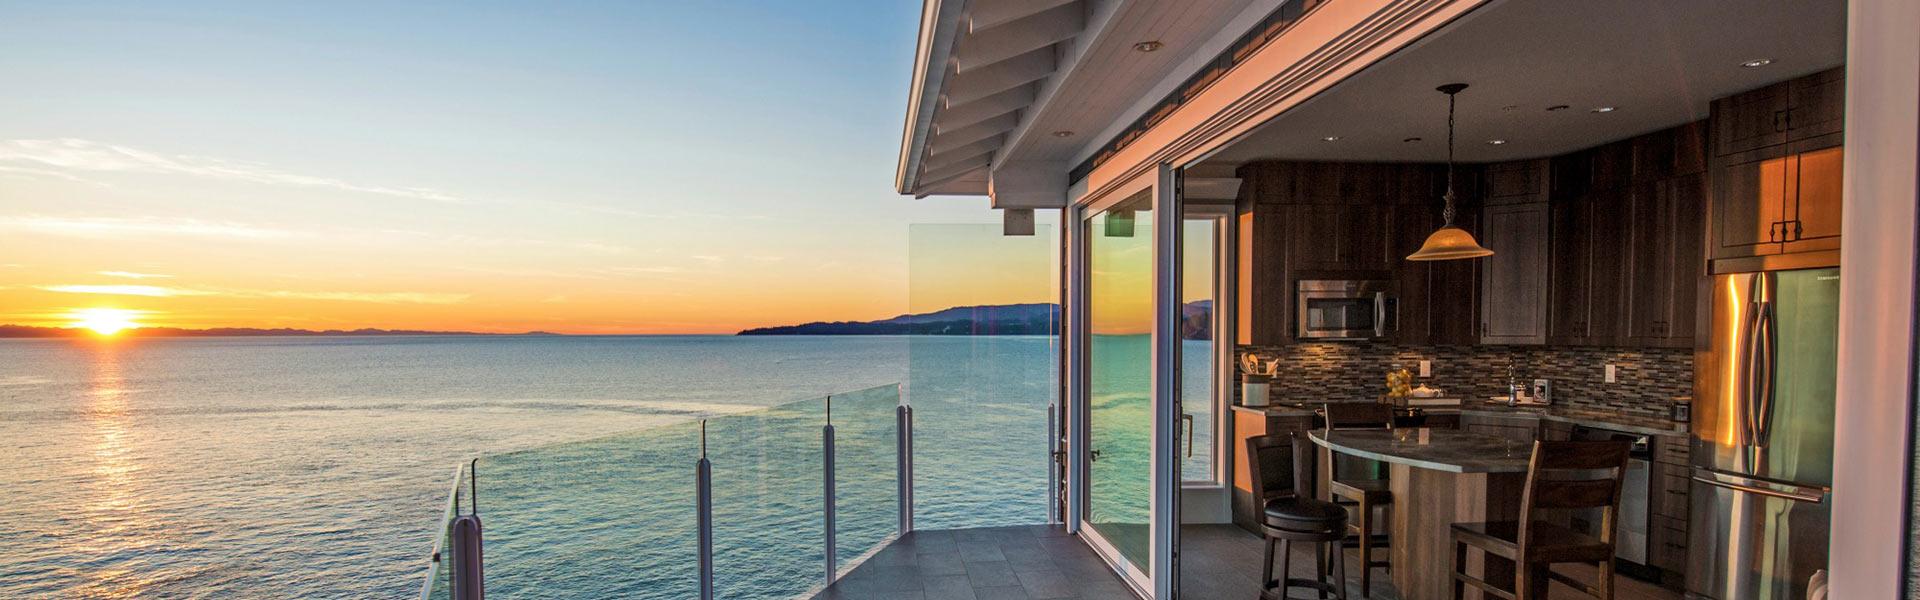 sooke-point-resort-cottage-sunset-about